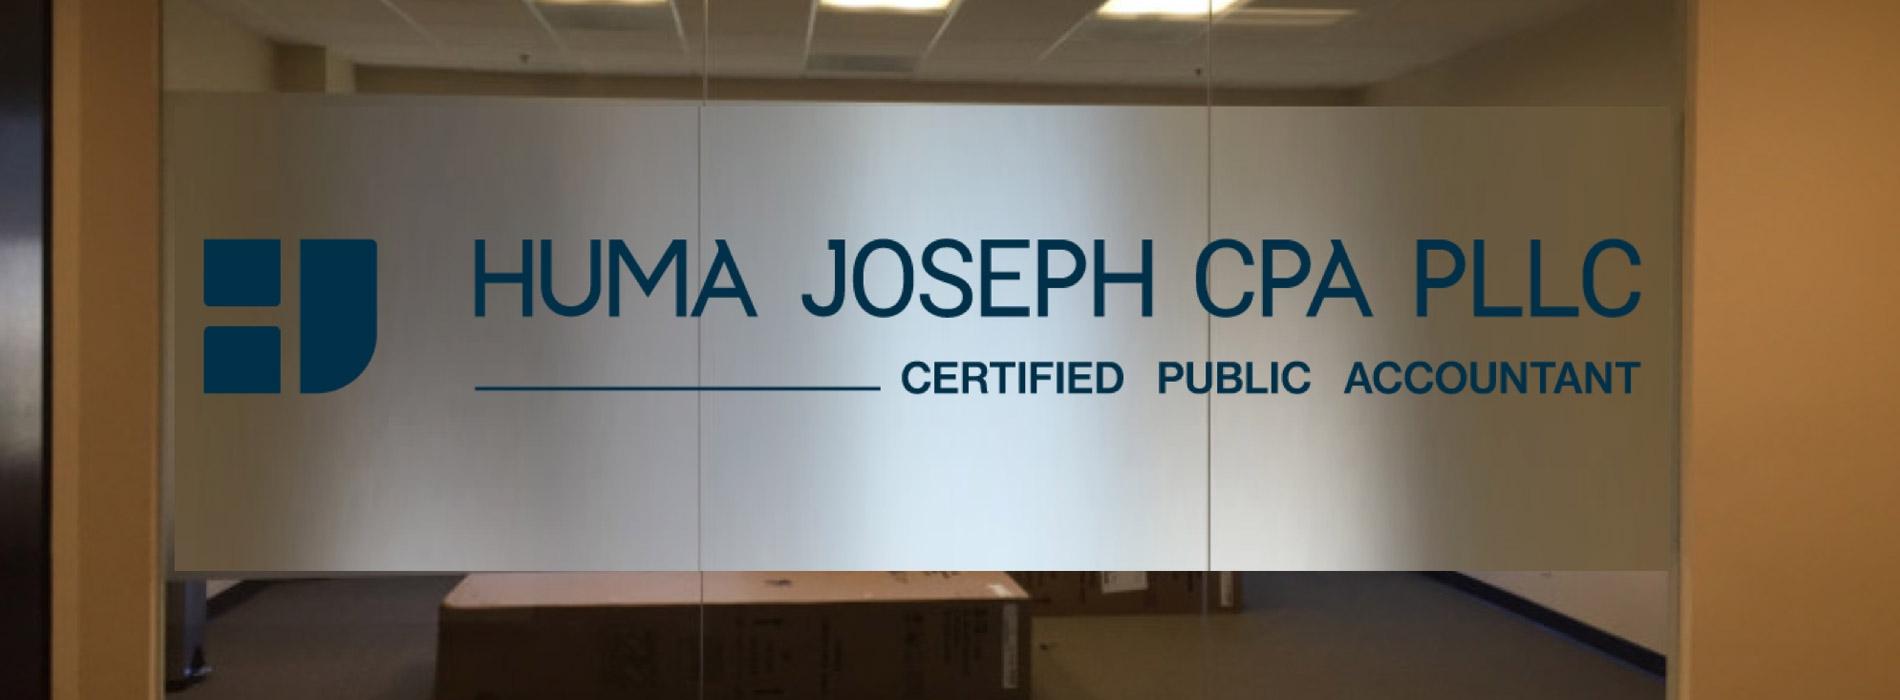 Huma Joseph CPA, PLLC (@humacpacedarpark) Cover Image